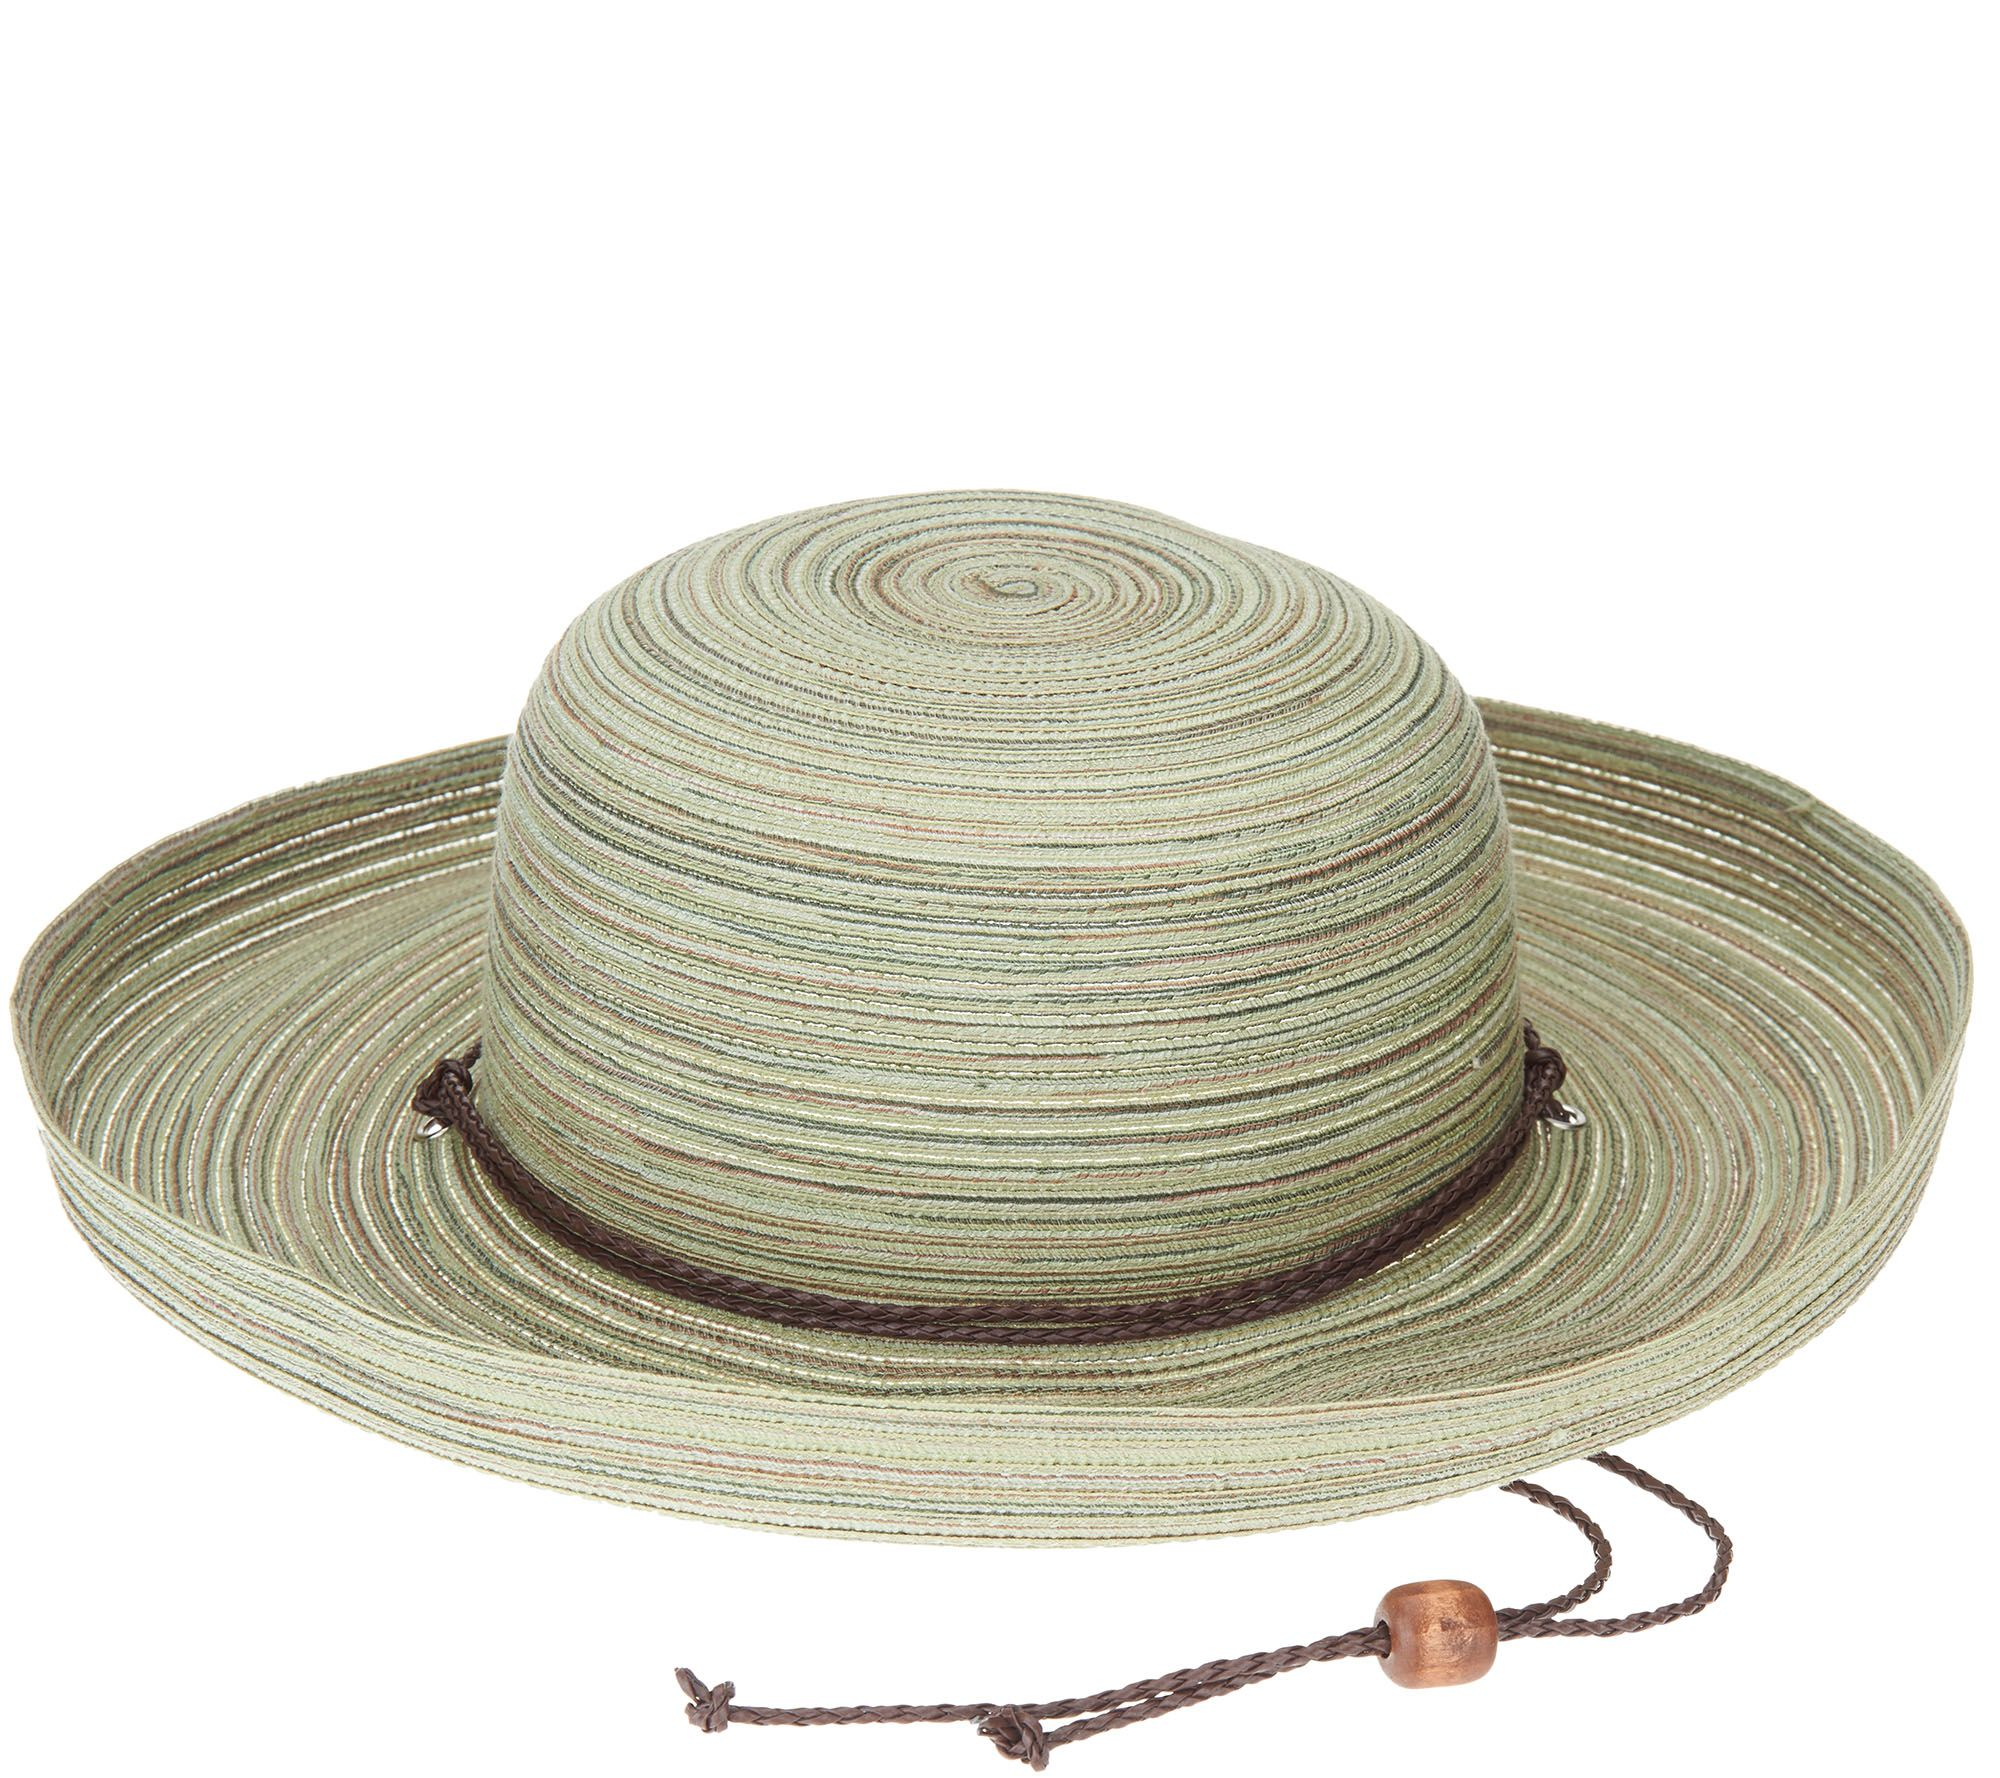 874390fe San Diego Hat Co. Mixed Braid Kettle Brim Sun Hat - Page 1 — QVC.com